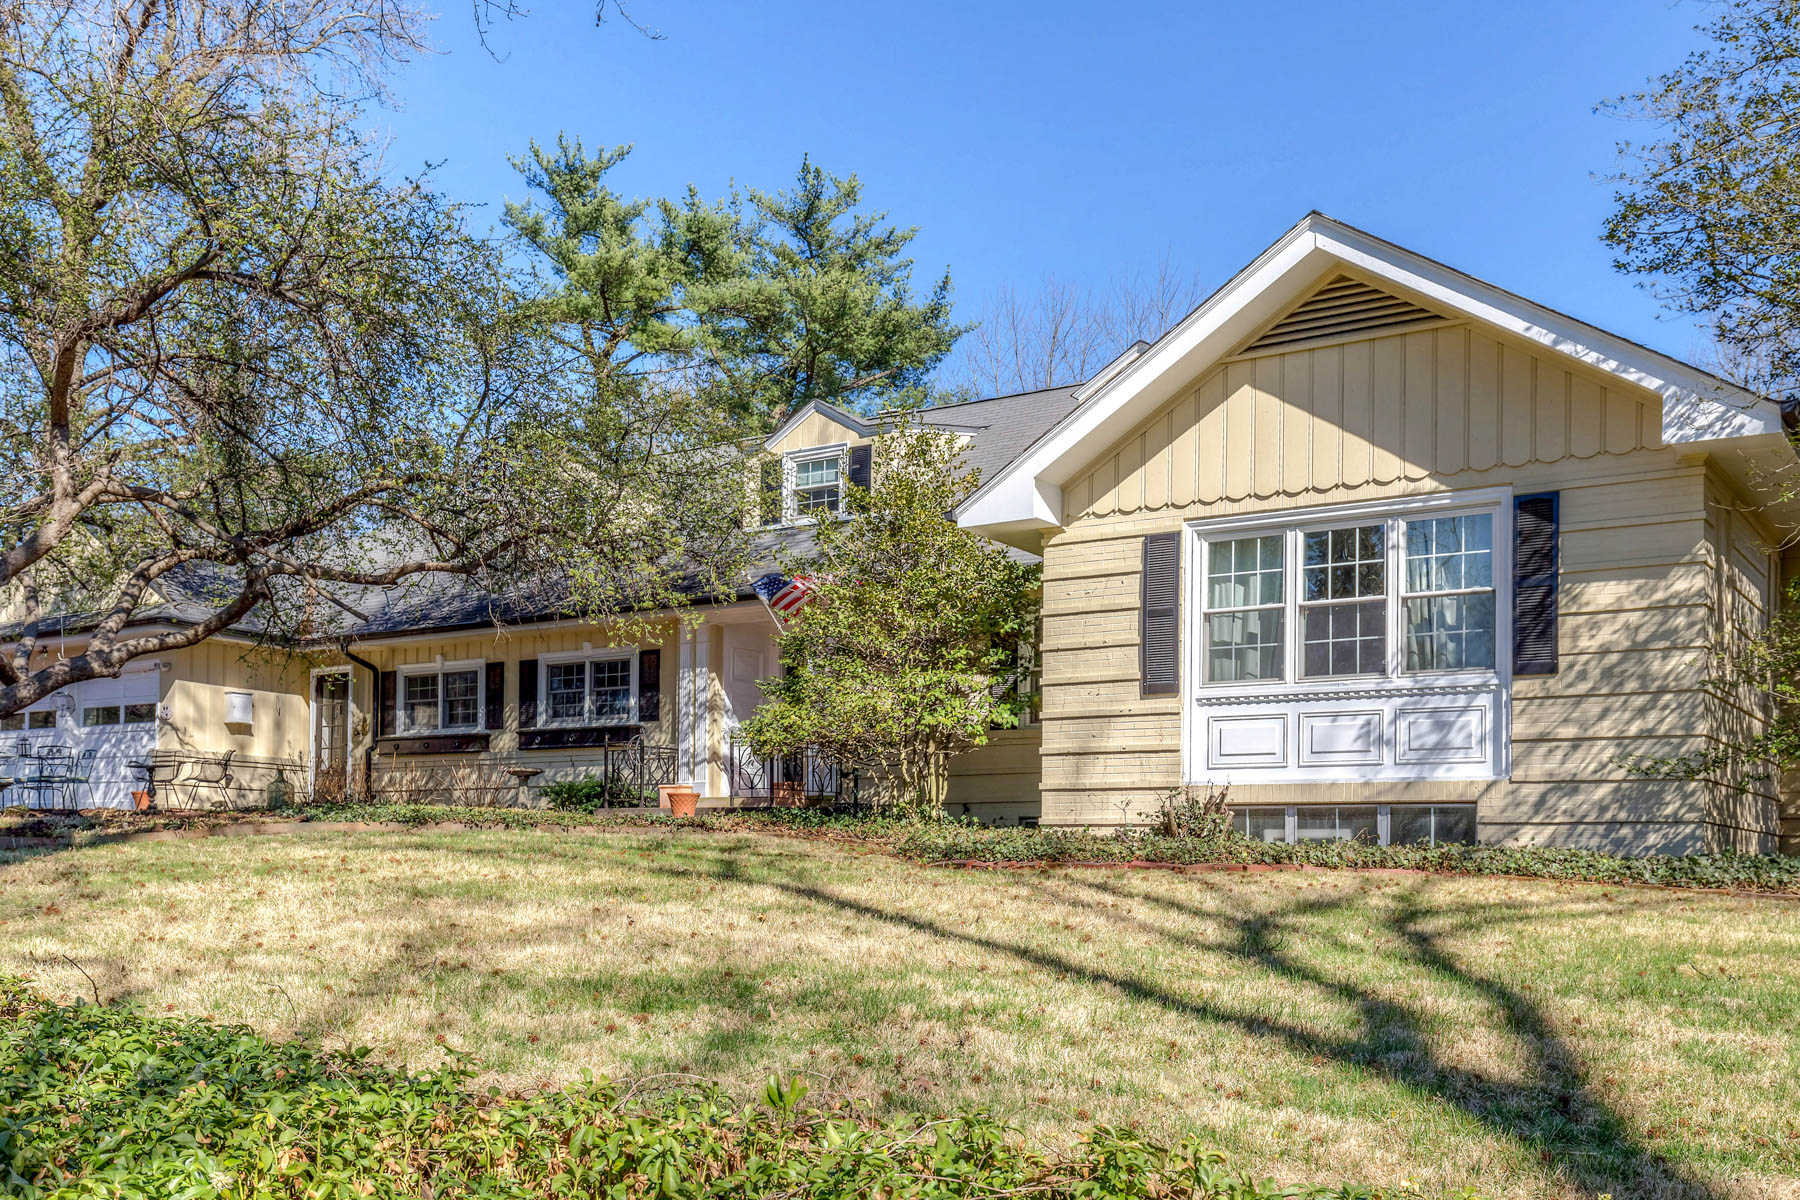 独户住宅 为 销售 在 Charming Colonial Cottage 3 Clermont Lane Ladue, 密苏里州, 63124 美国